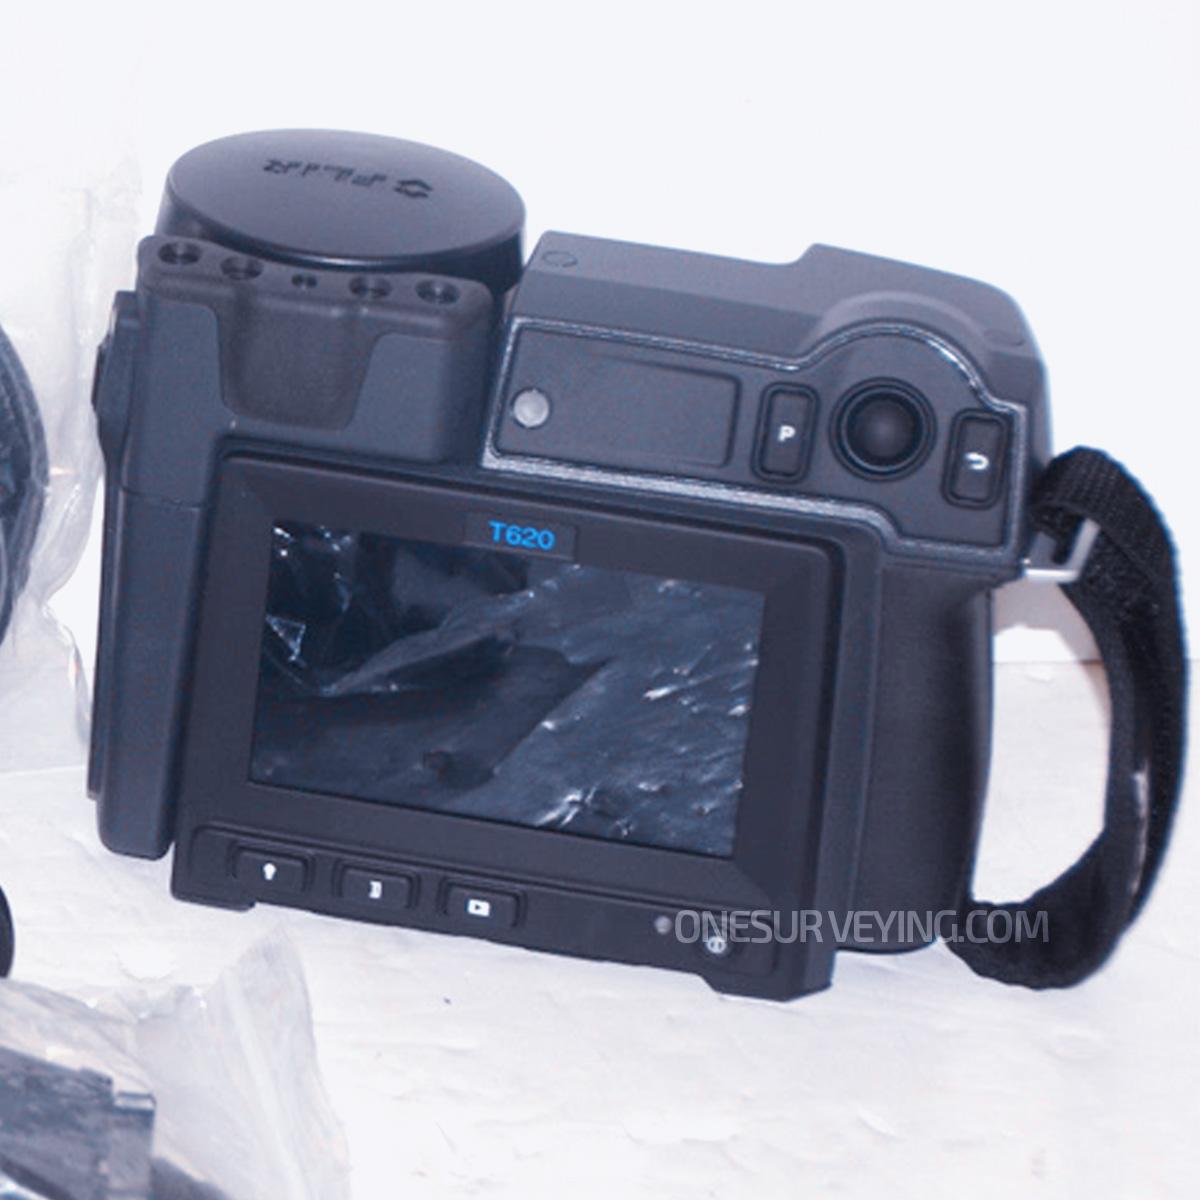 FLIR-T620-Thermal-Imaging-price.jpg